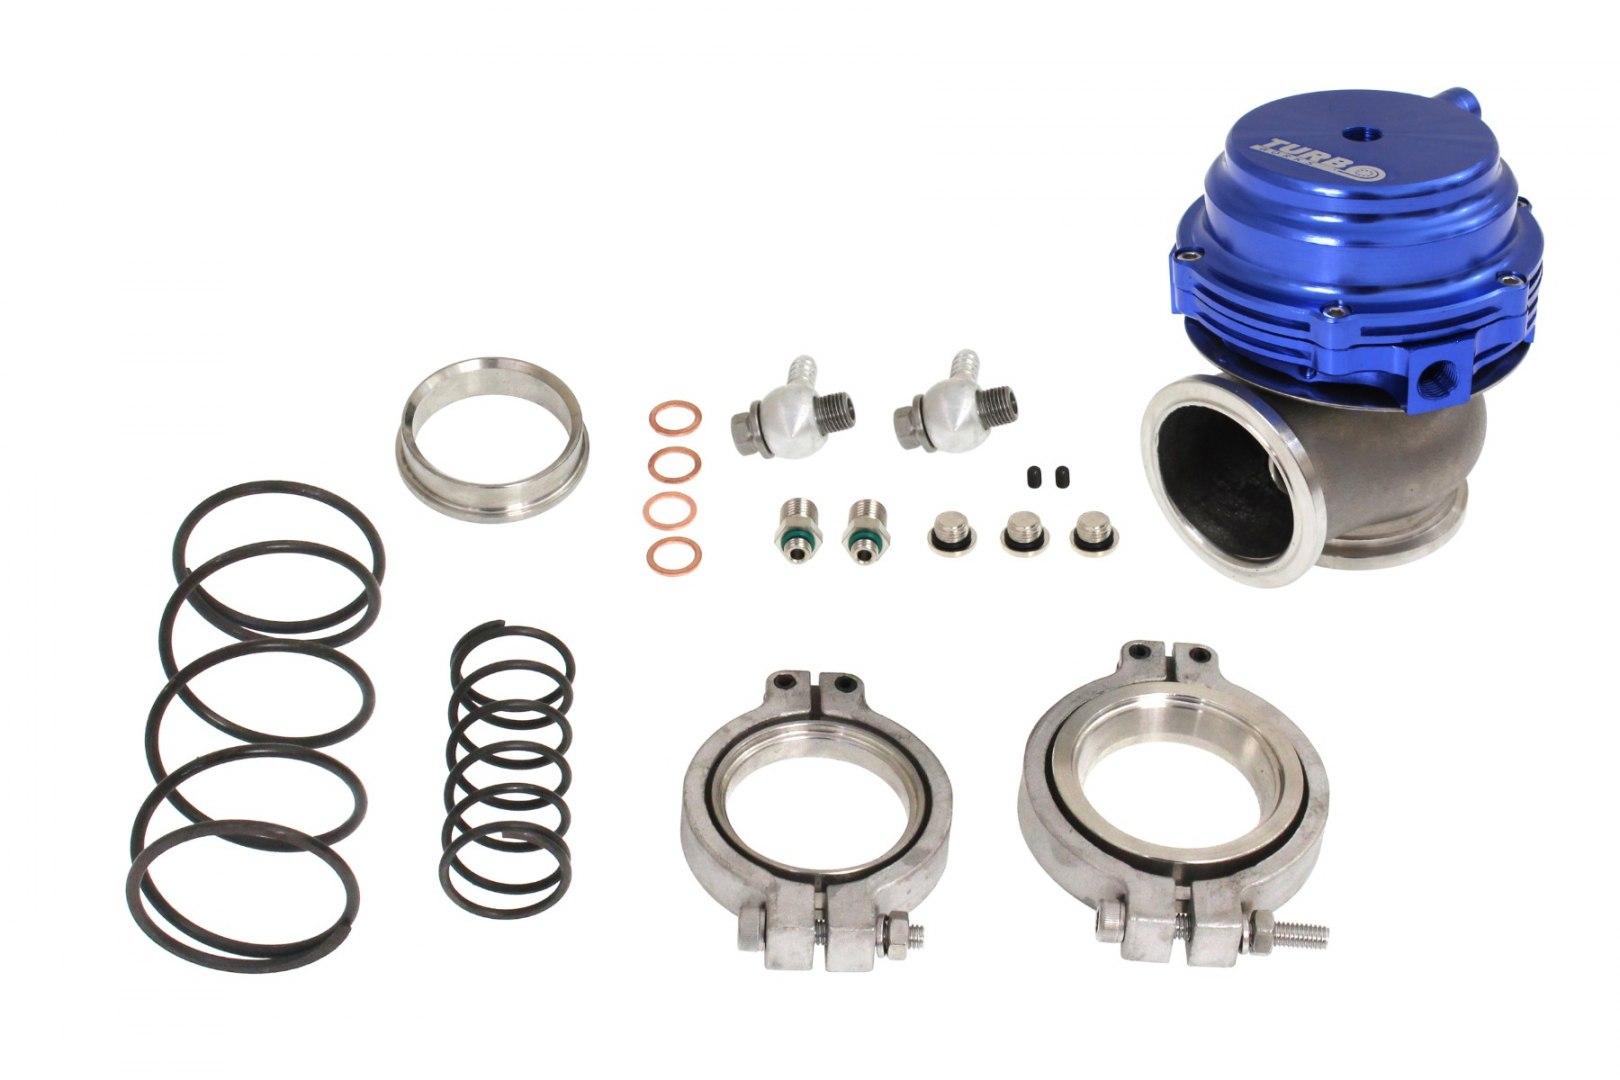 Wastegate zewnętrzny TurboWorks 44mm 1,6 Bar V-Band Blue - GRUBYGARAGE - Sklep Tuningowy